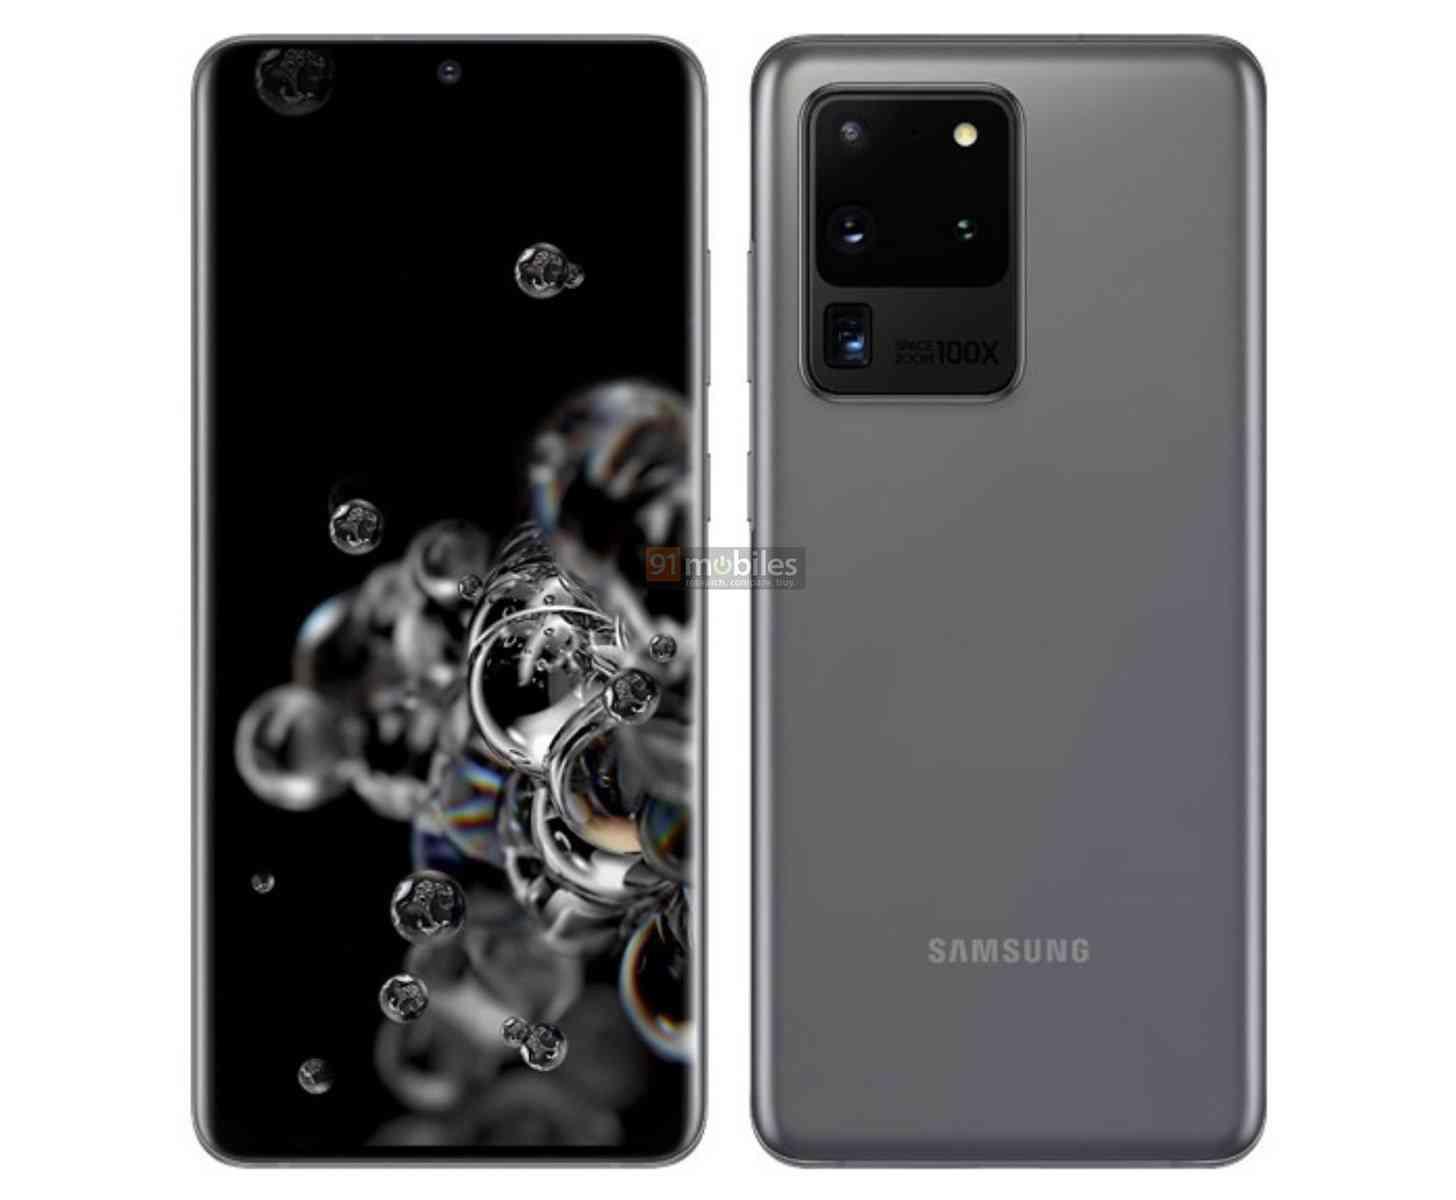 Galaxy S20 Ultra image leak